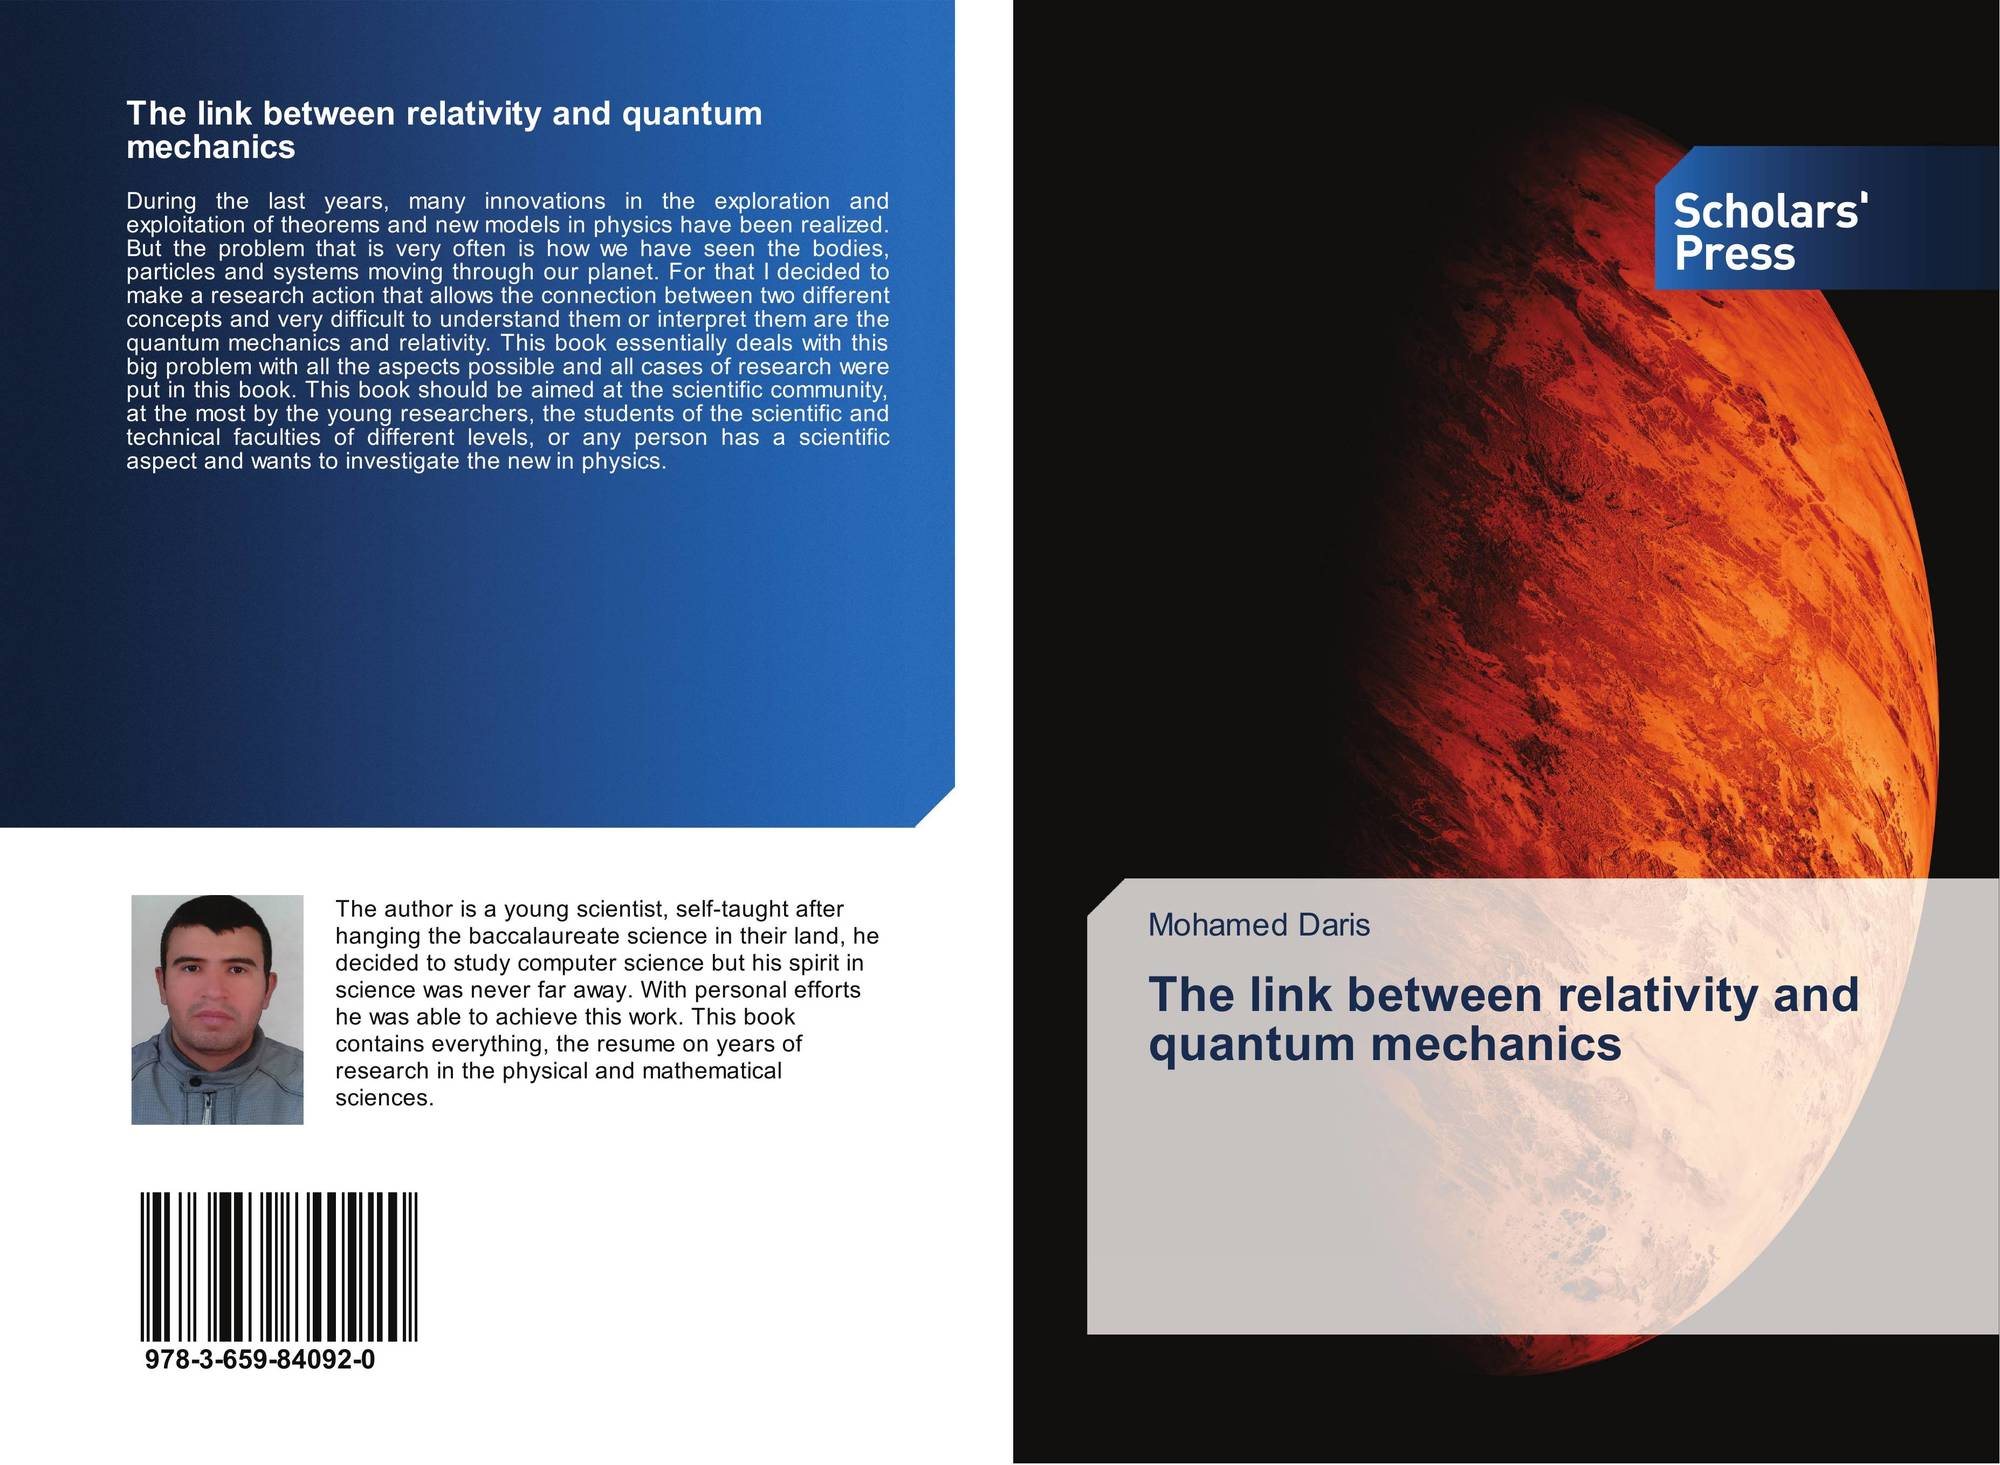 The link between relativity and quantum mechanics, 978-3-659